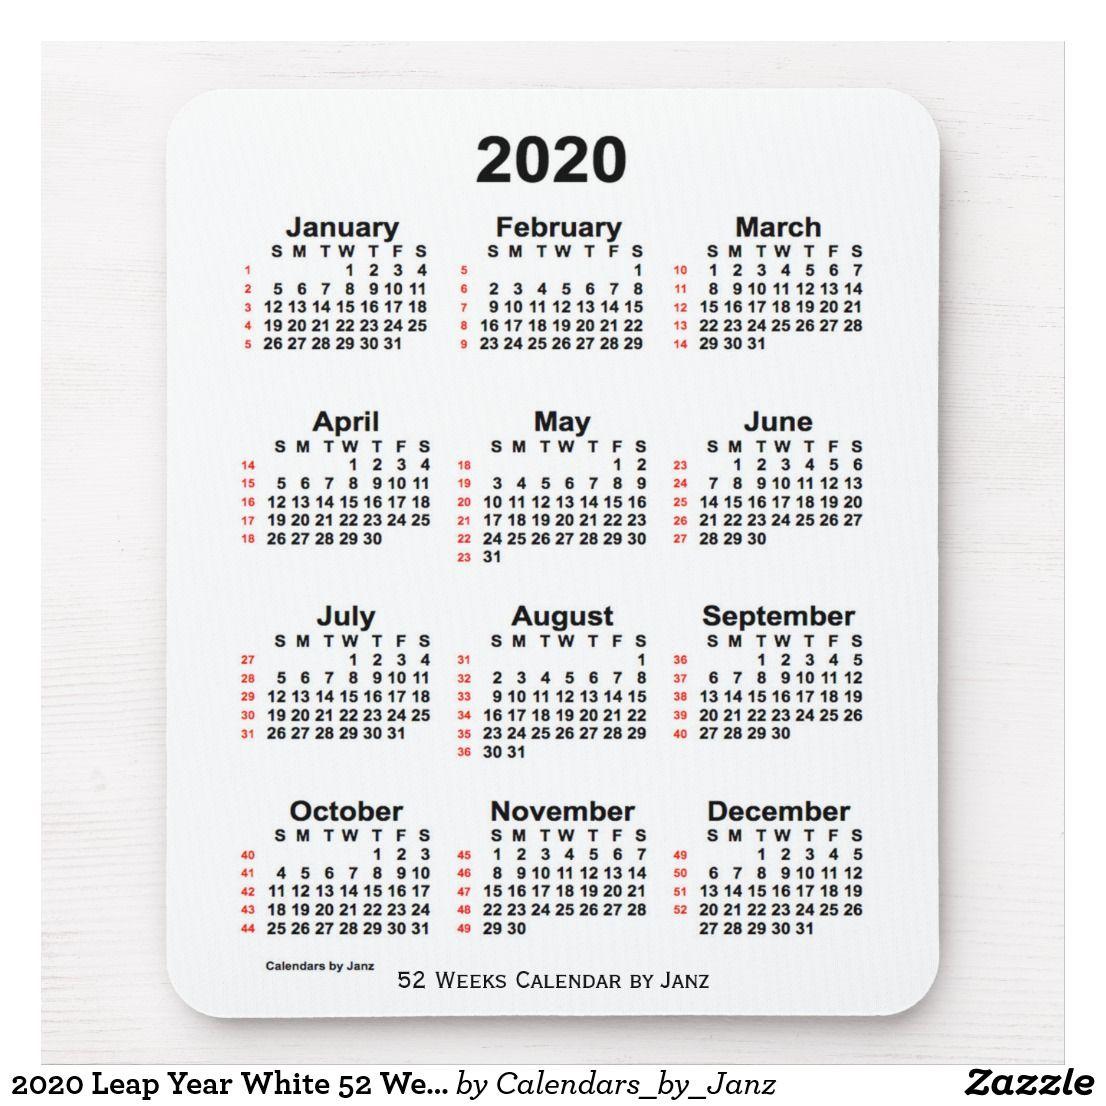 52 Week Calendar 2020 2020 Leap Year White 52 Week Calendar by Janz Mouse Pad | Zazzle